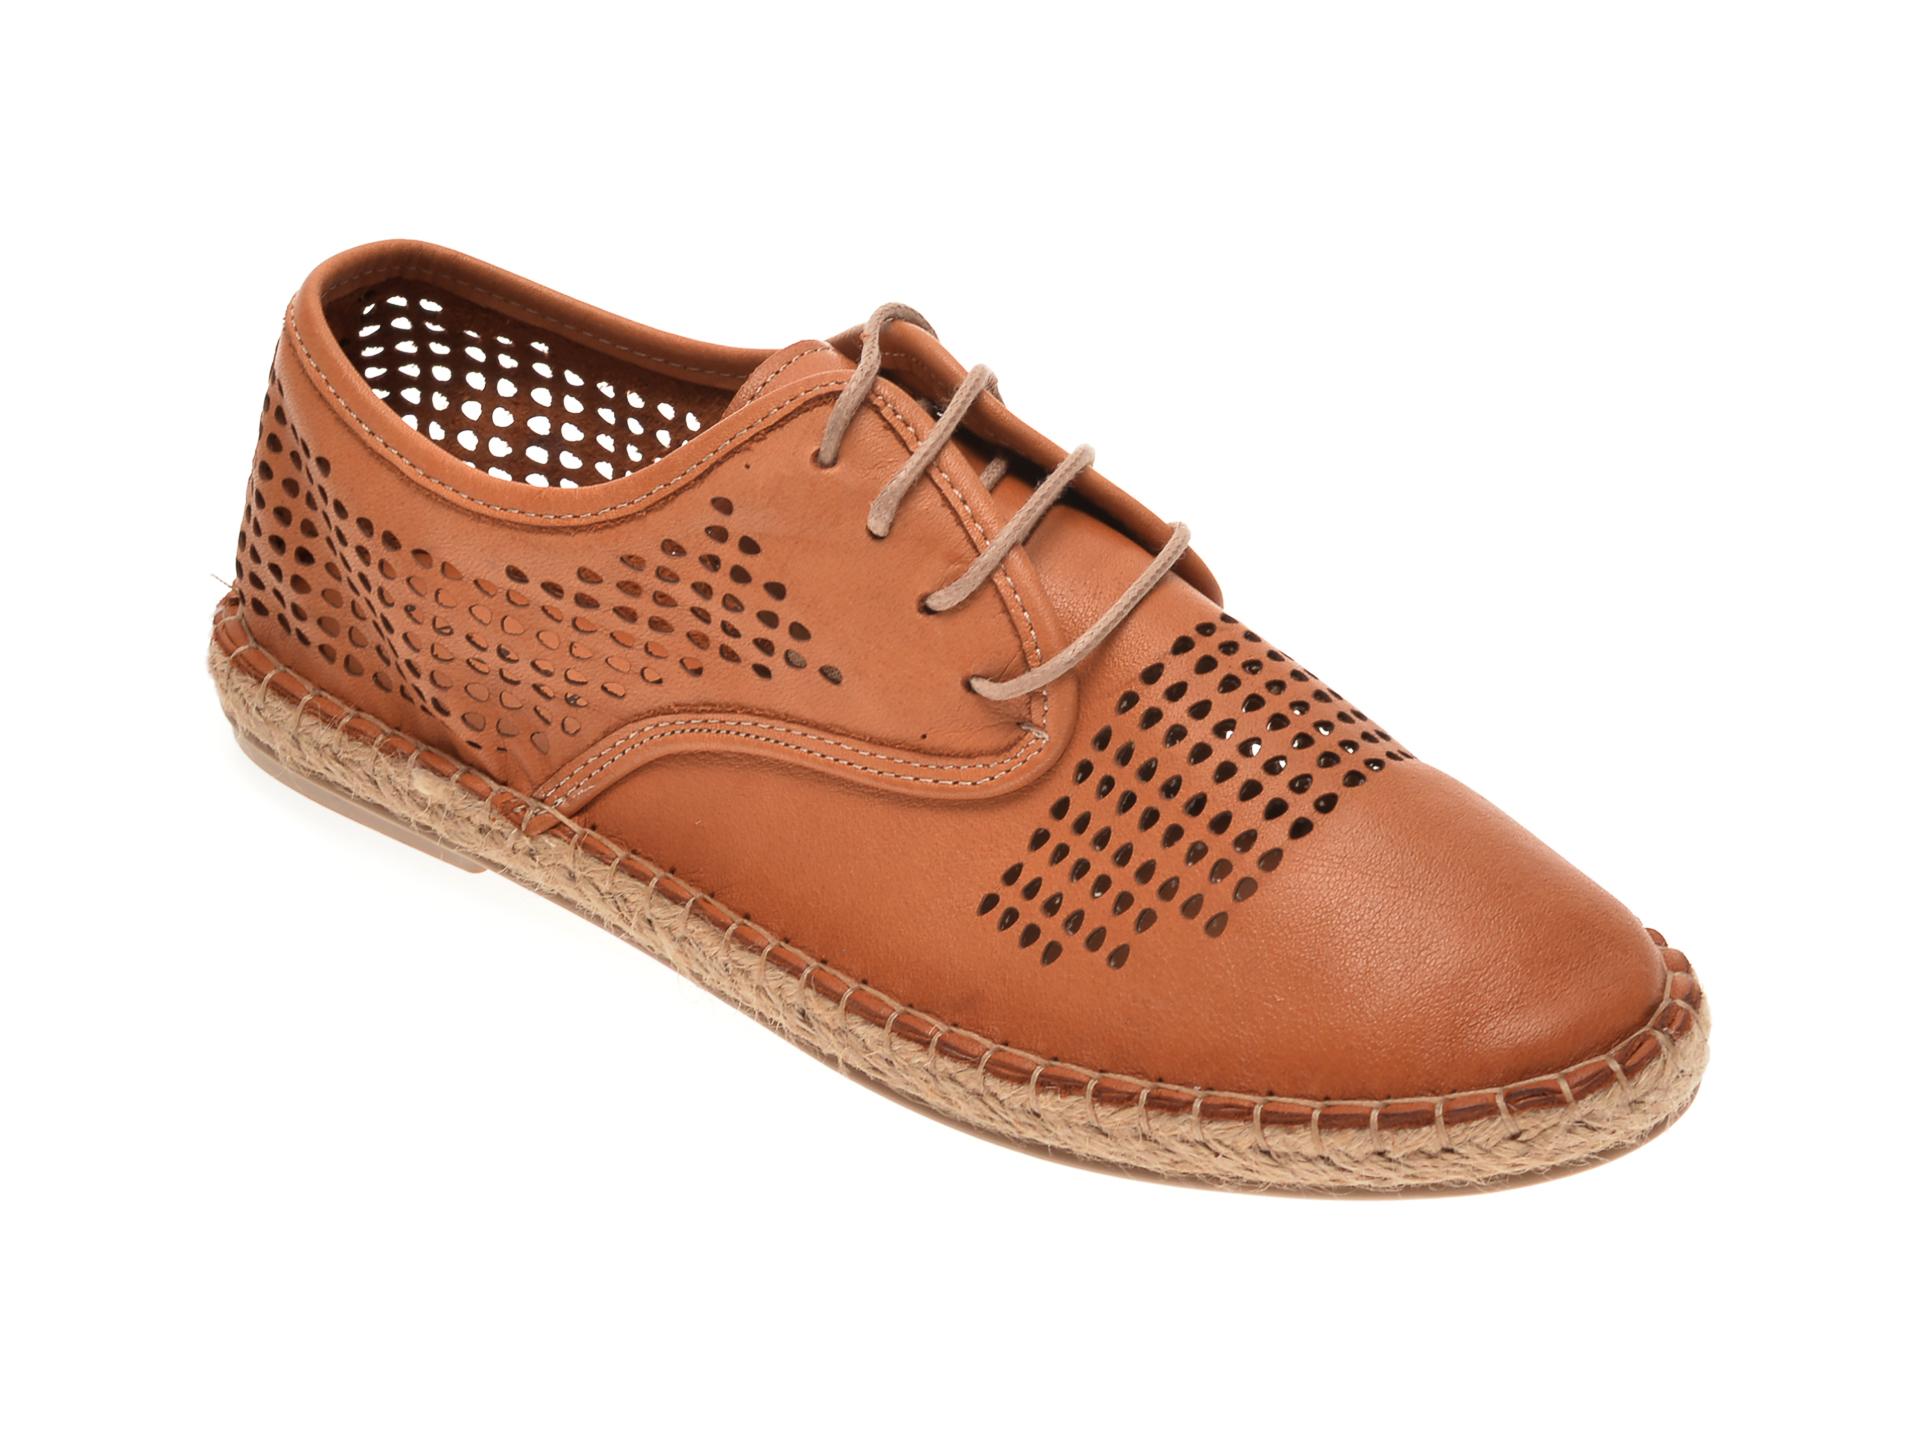 Pantofi BABOOS maro, R03, din piele naturala imagine